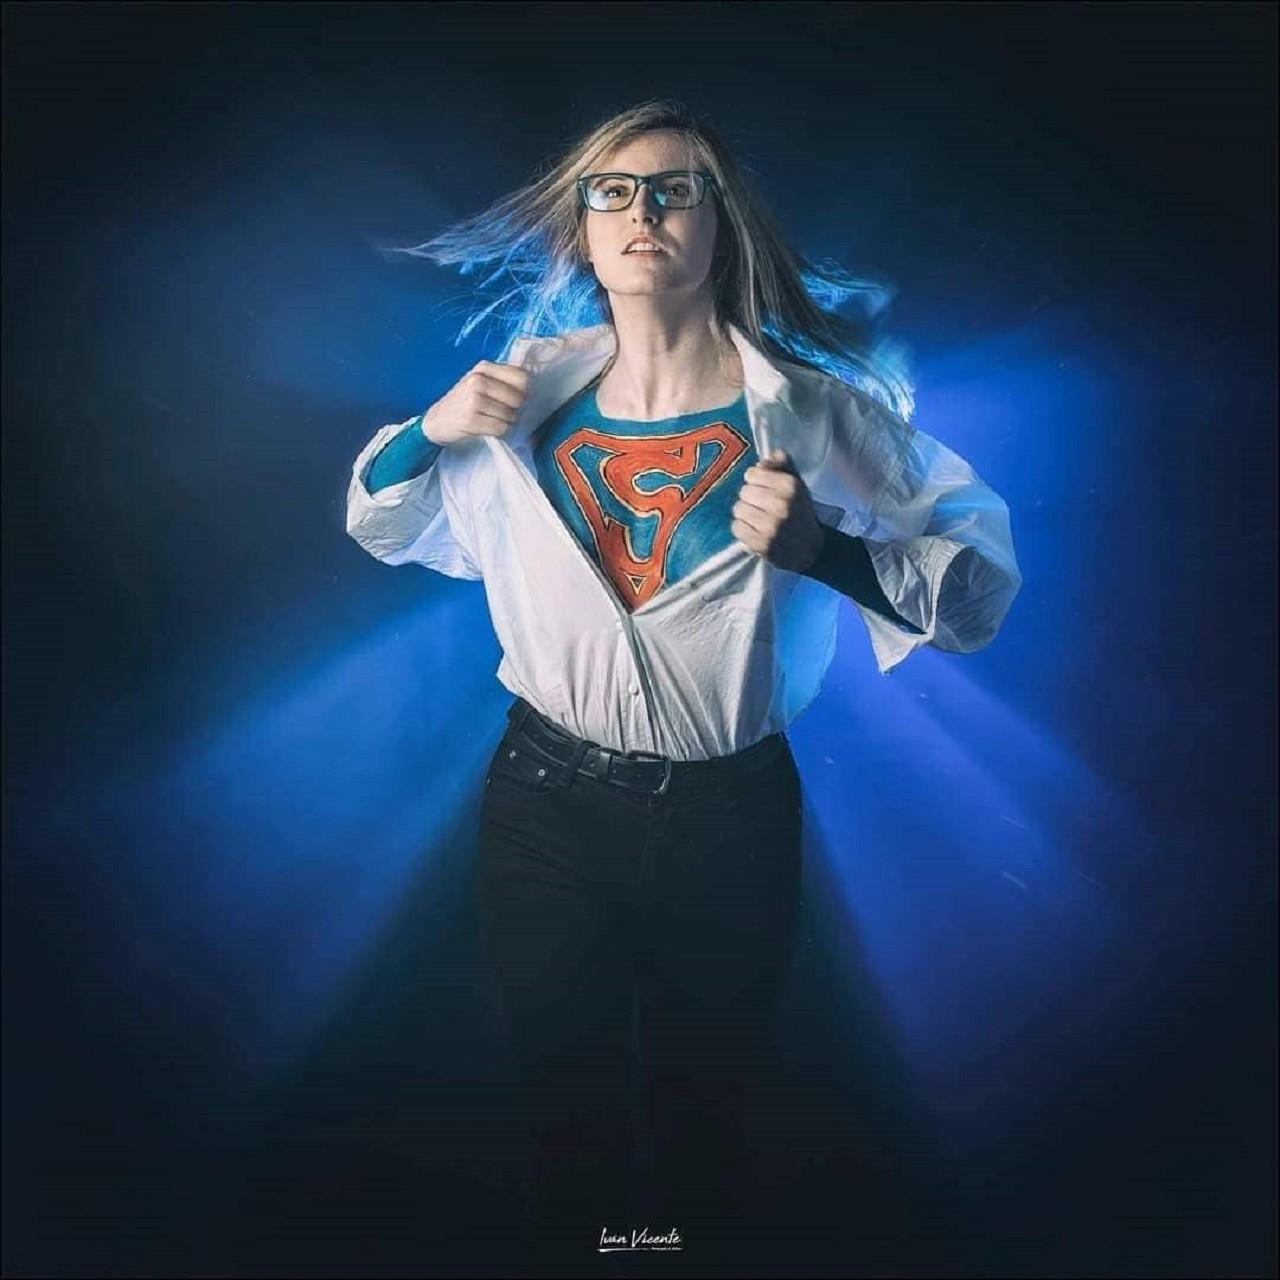 Supergirl DC Comics Cosplay Body Paint